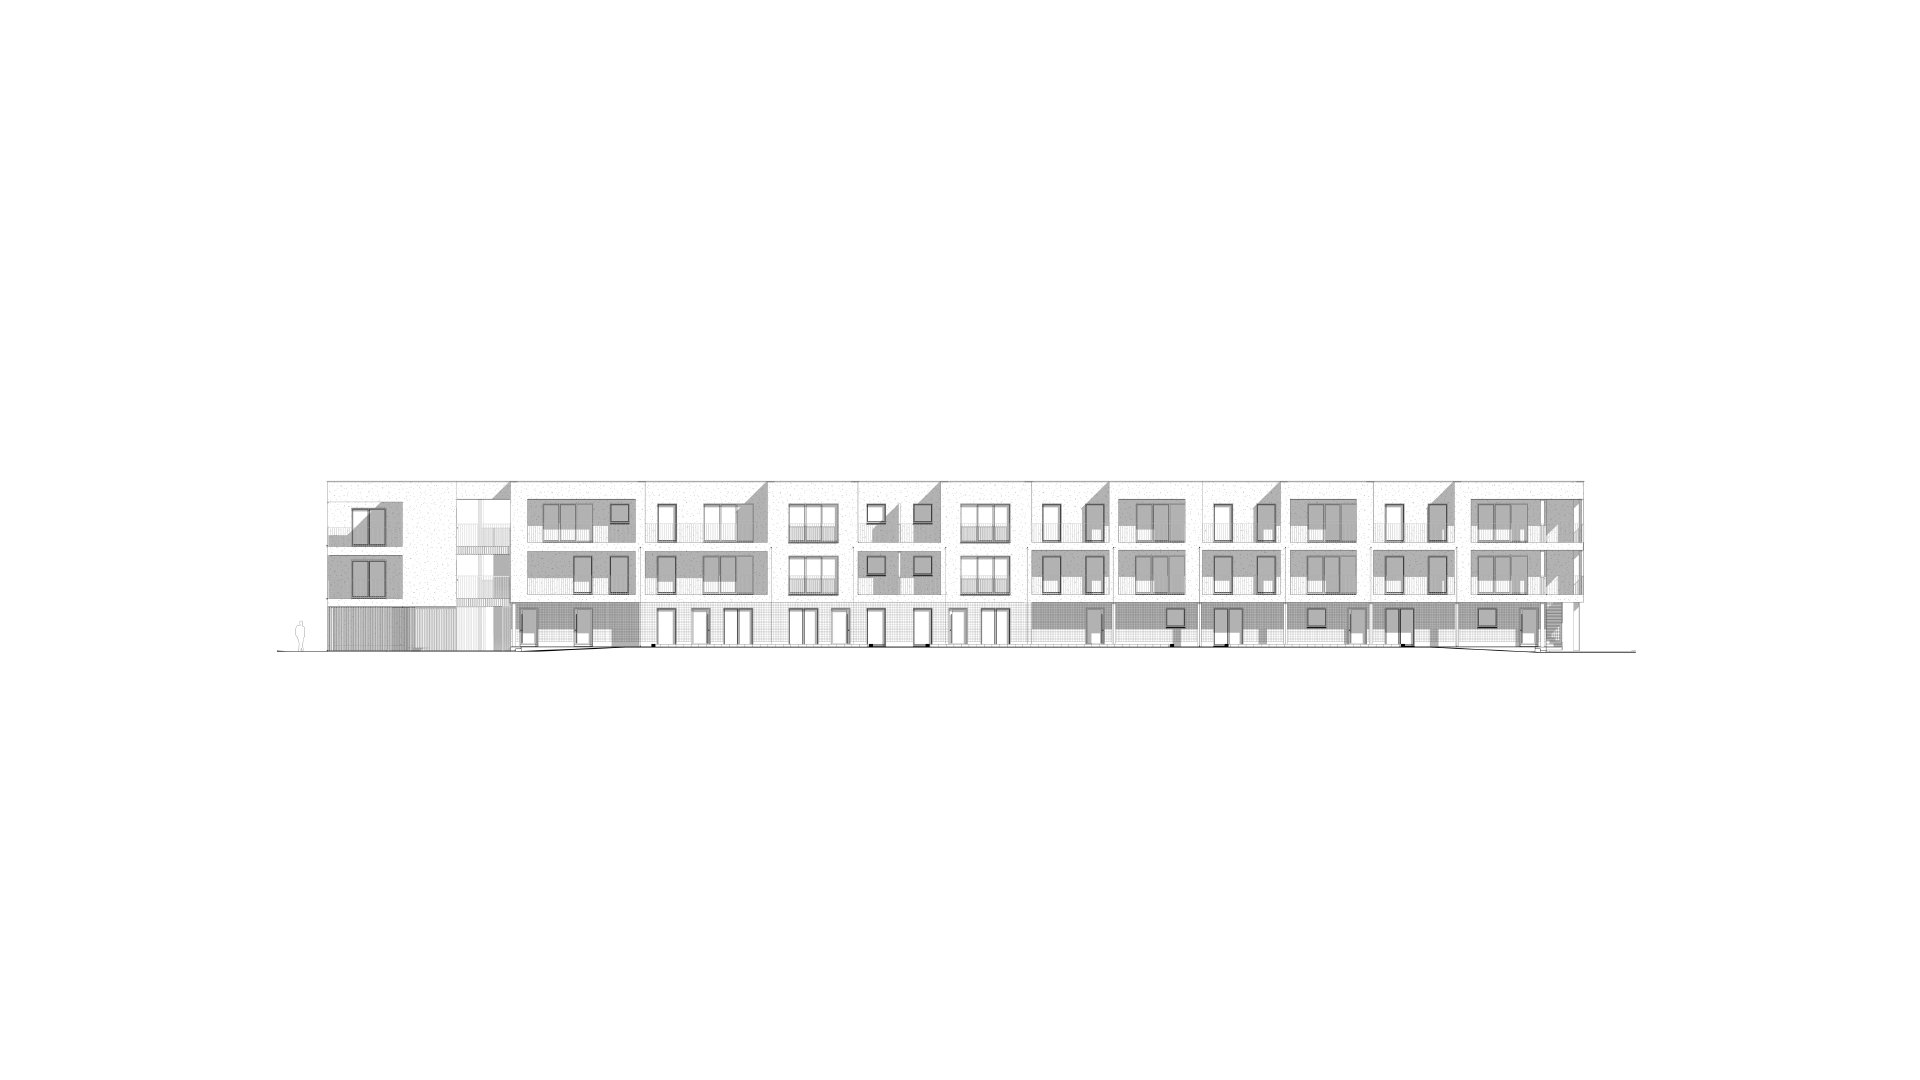 Rauter, collectieve woningen, Anderlecht-1989695254